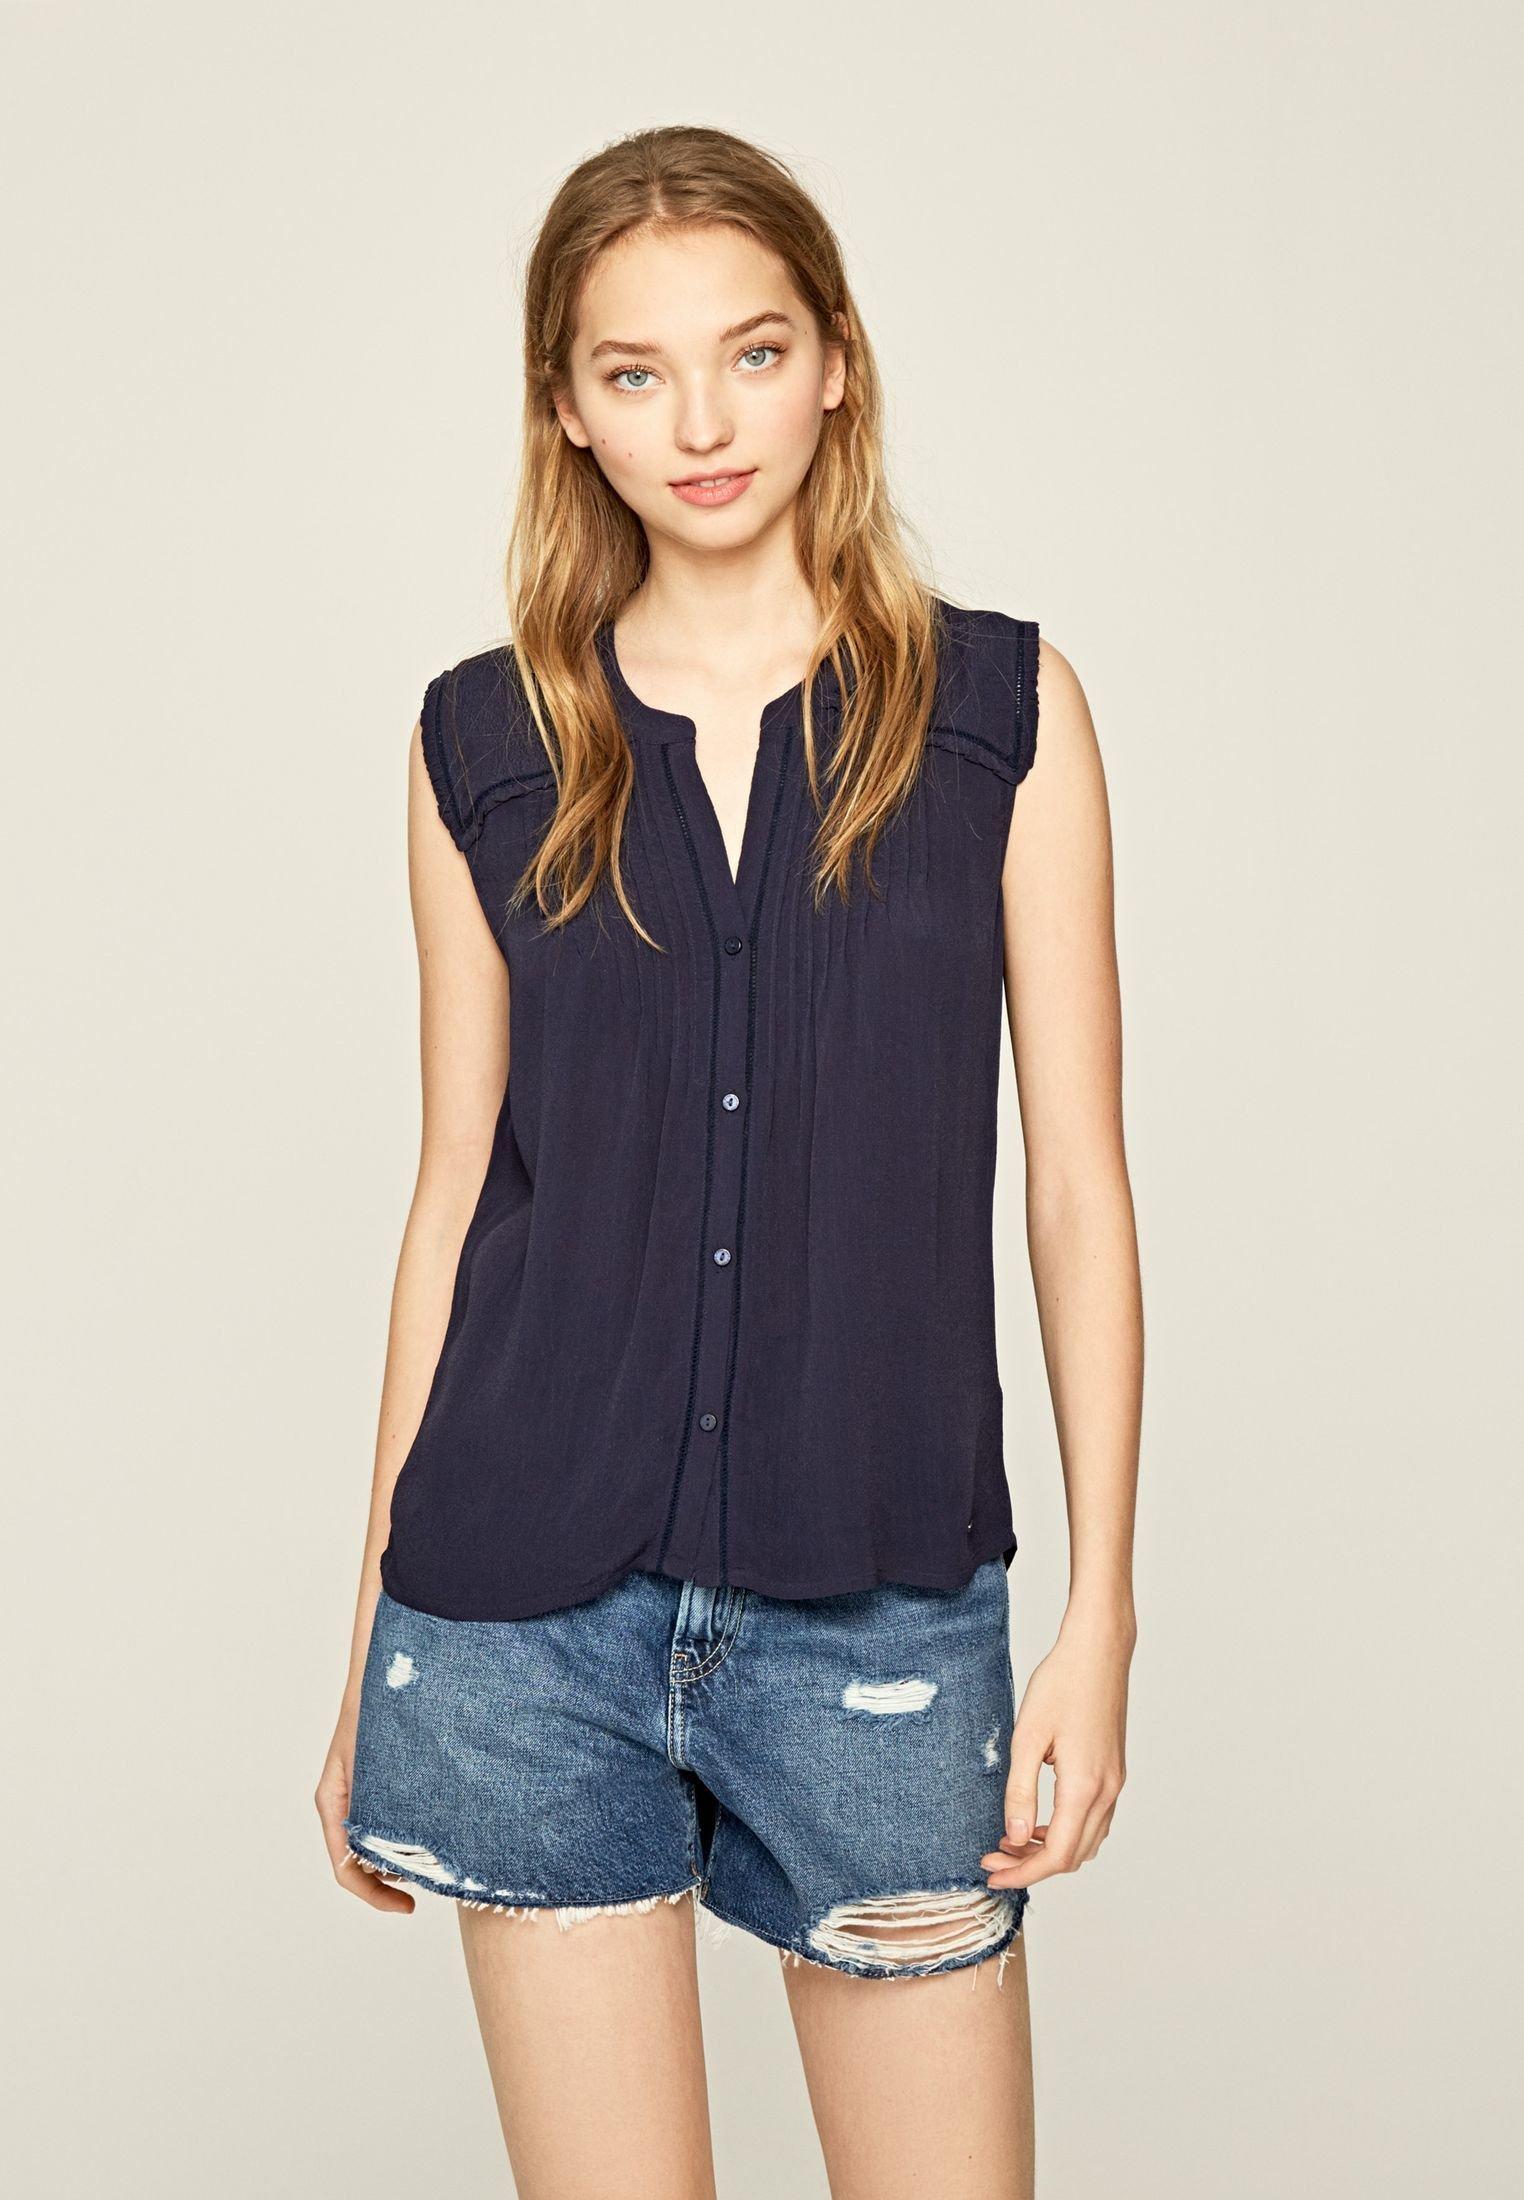 Pepe Jeans JOAN - Blouse - dark ozaen blue - Tops & T-shirts Femme 0VcaI